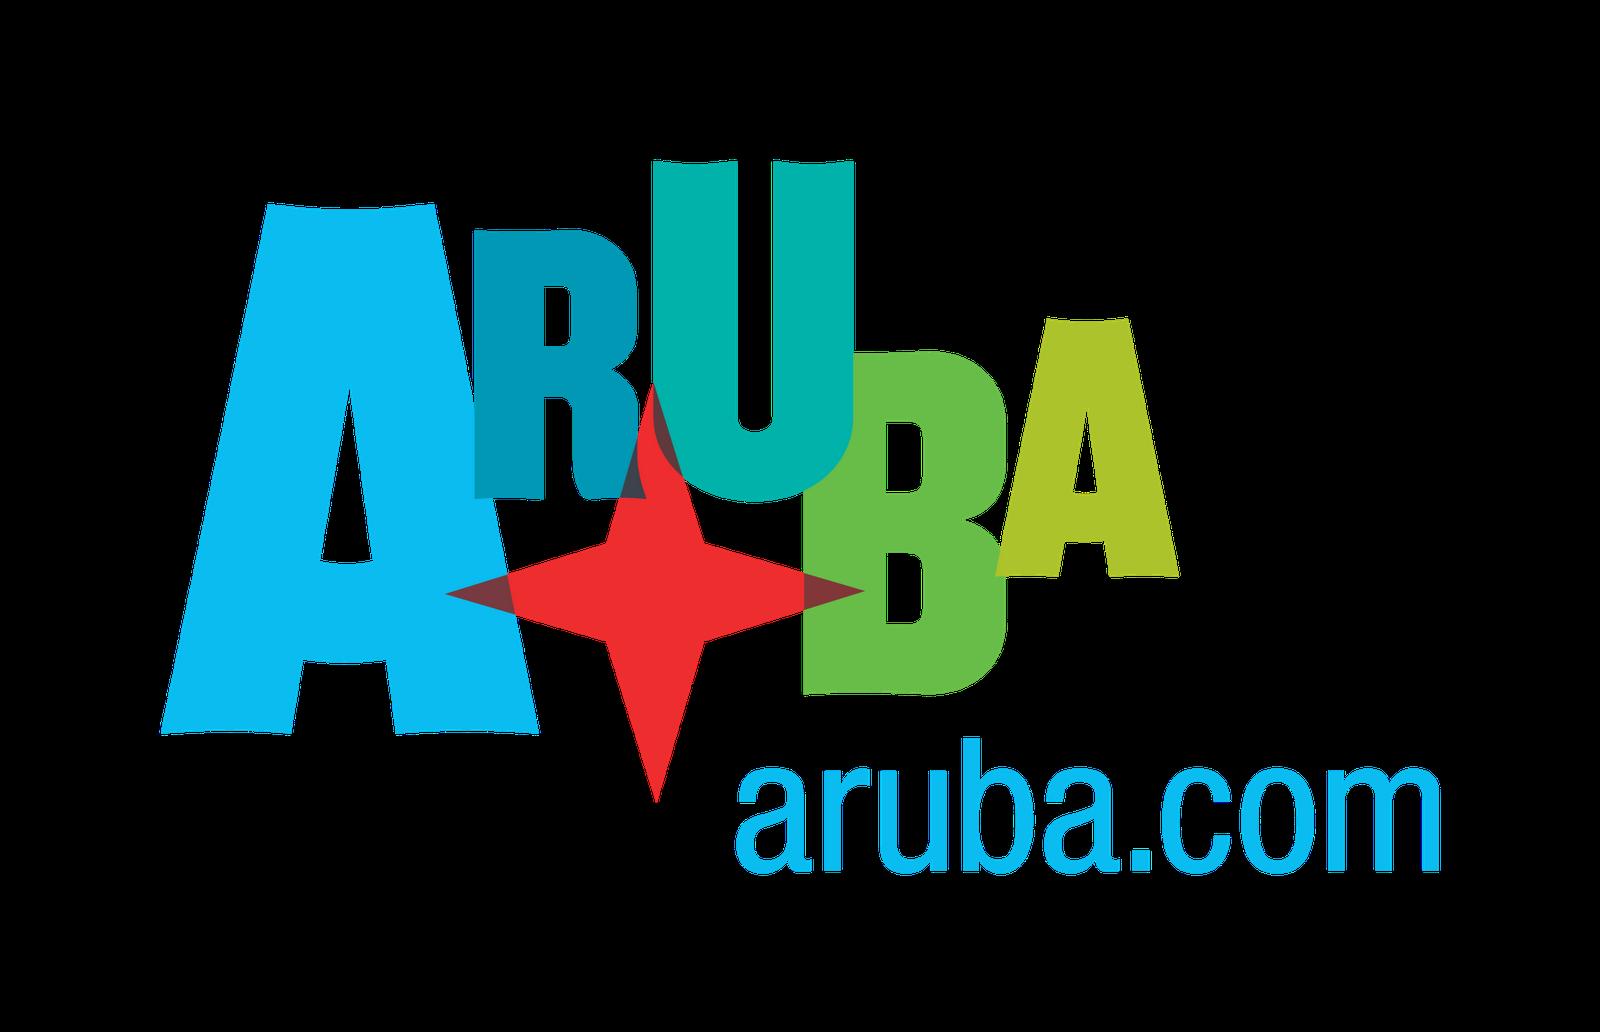 . PlusPng.com Aruba-Logo.png PlusPng.com  - Aruba PNG